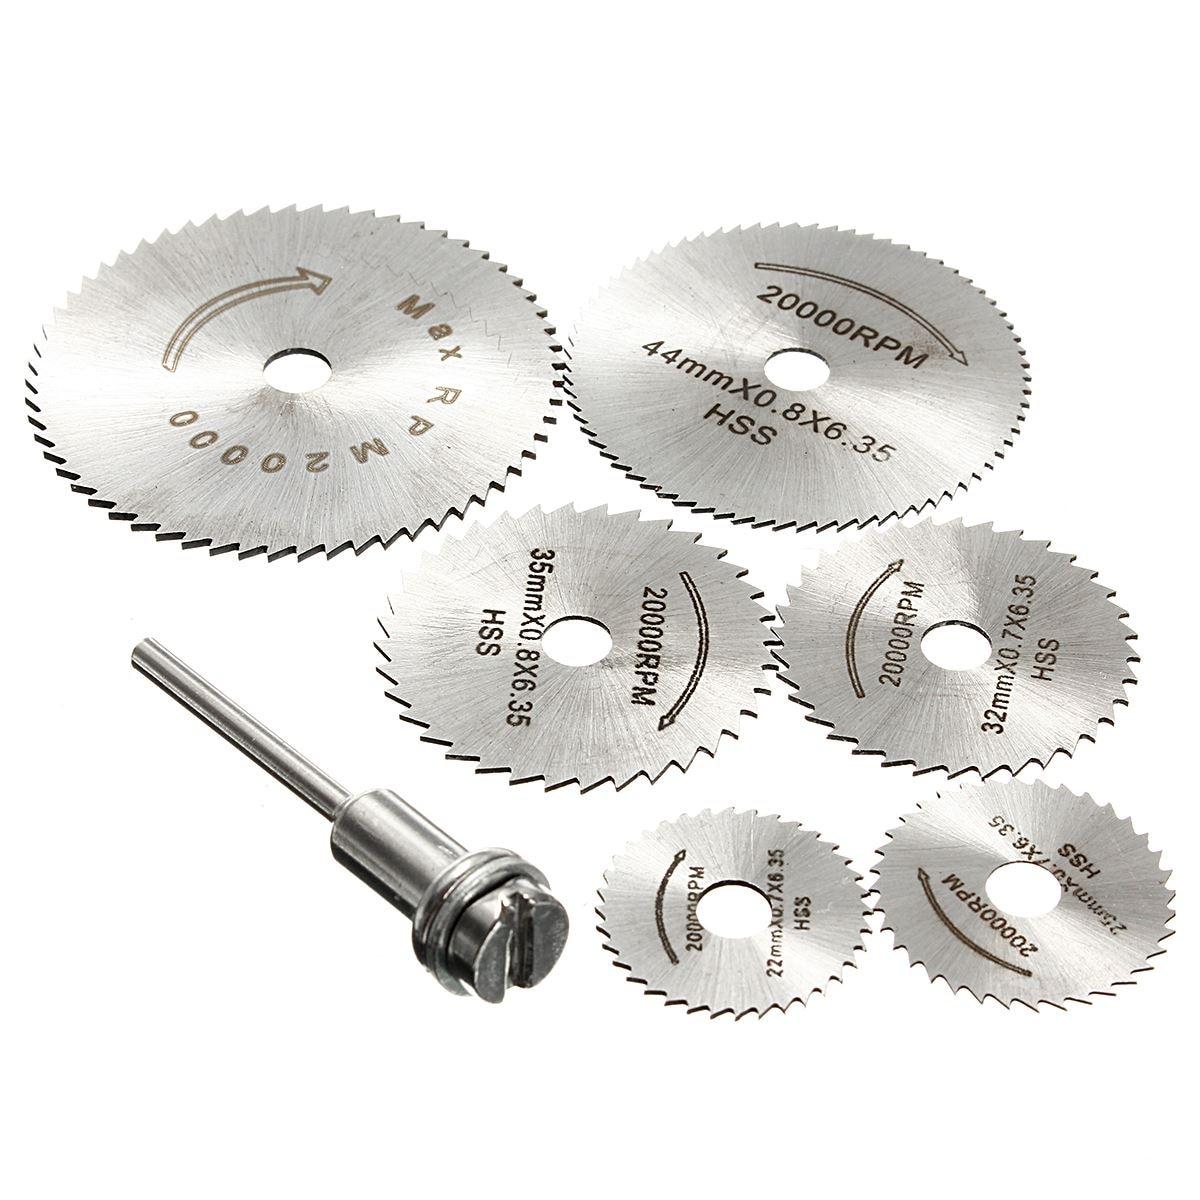 ₪ pcs set hss circular saw blades 【ᗑ】 mm